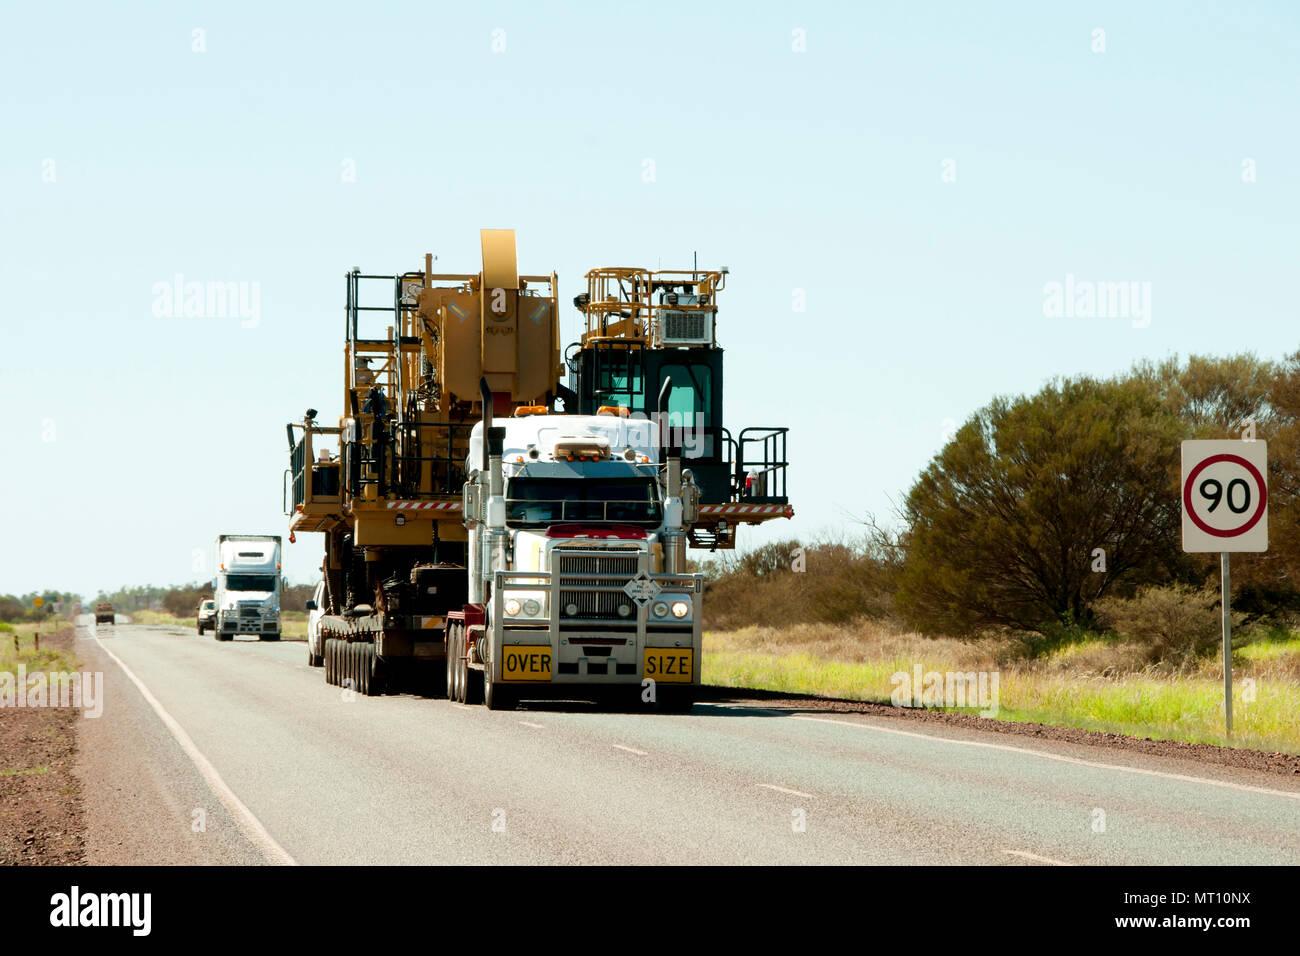 Oversize Heavy Machinery Transport - Stock Image